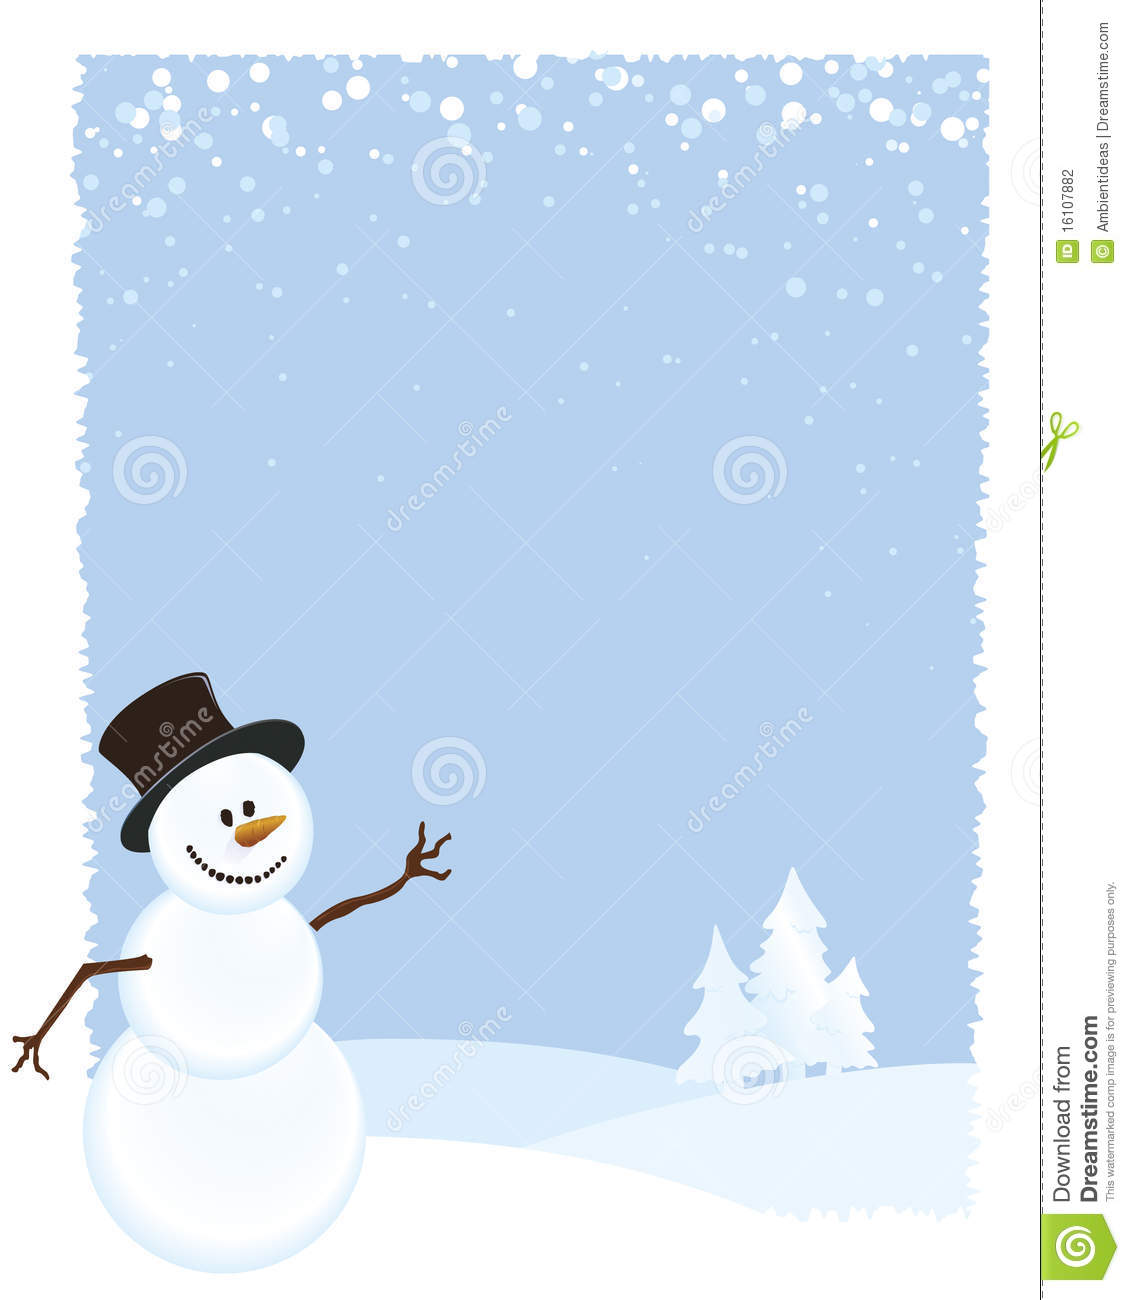 Winter Scenes Clipart - Clipart Suggest